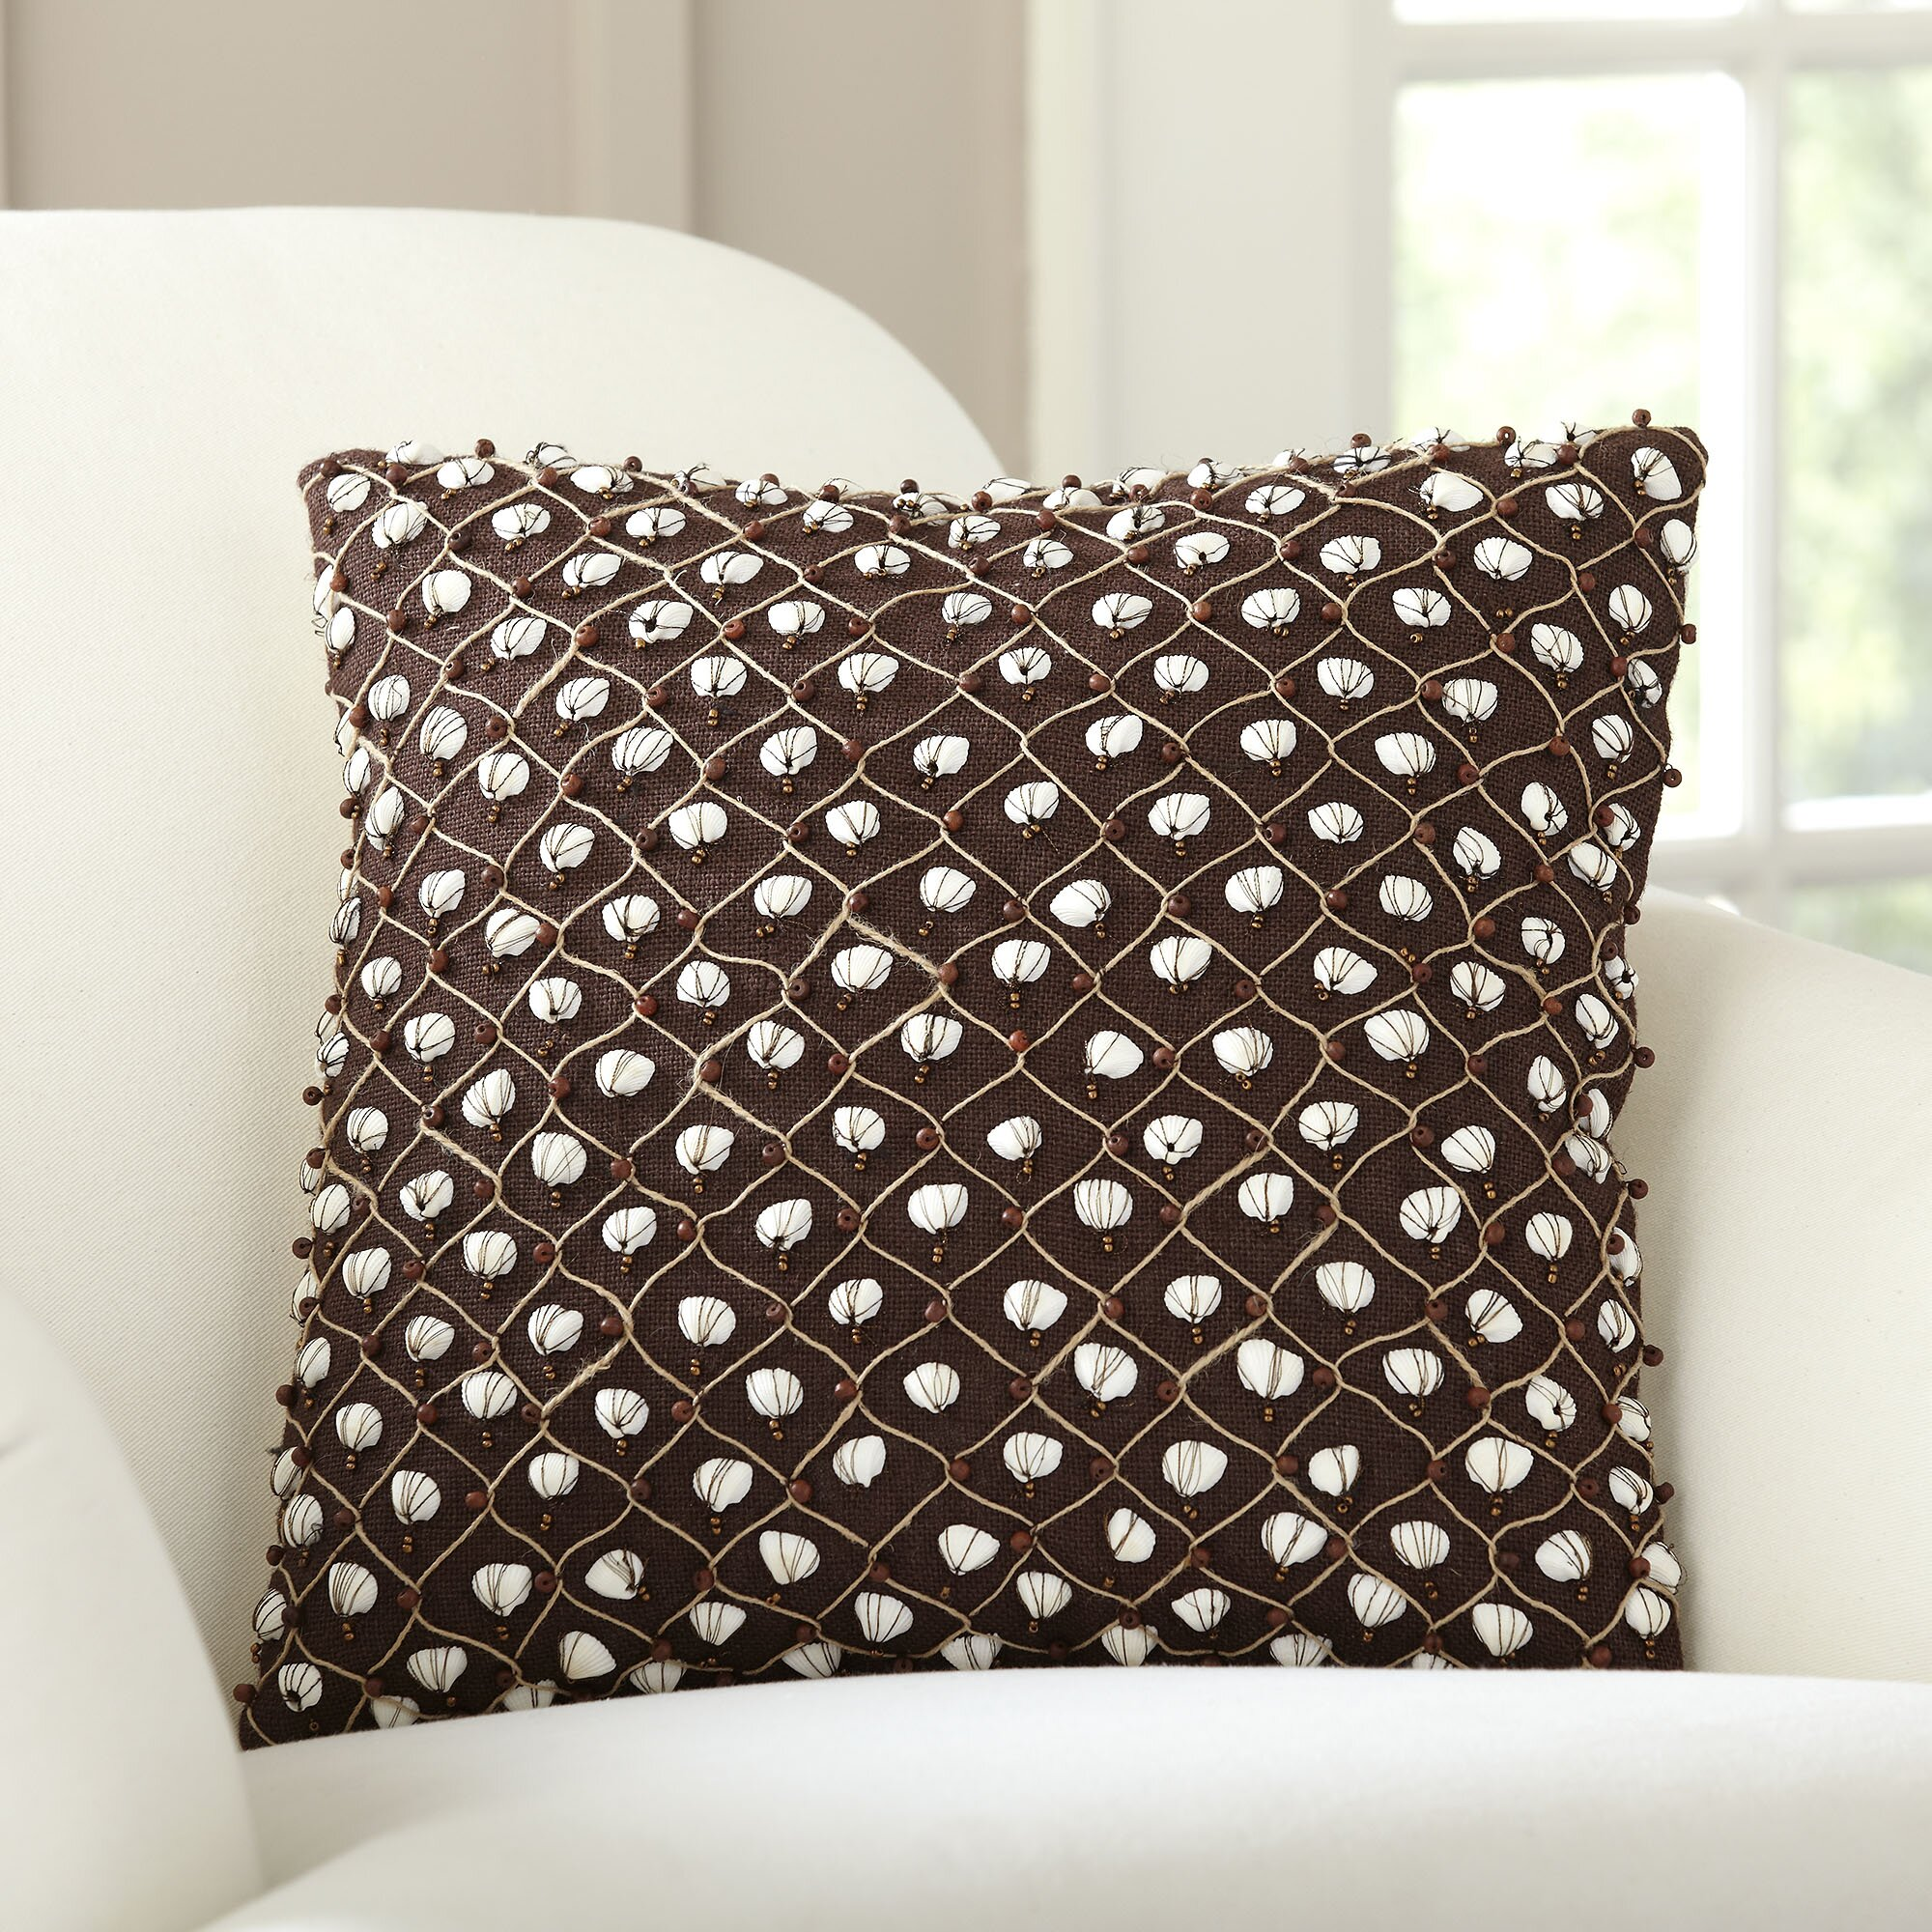 Decorative Pillows With Embellishments : Birch Lane Current Embellished Throw Pillow & Reviews Wayfair